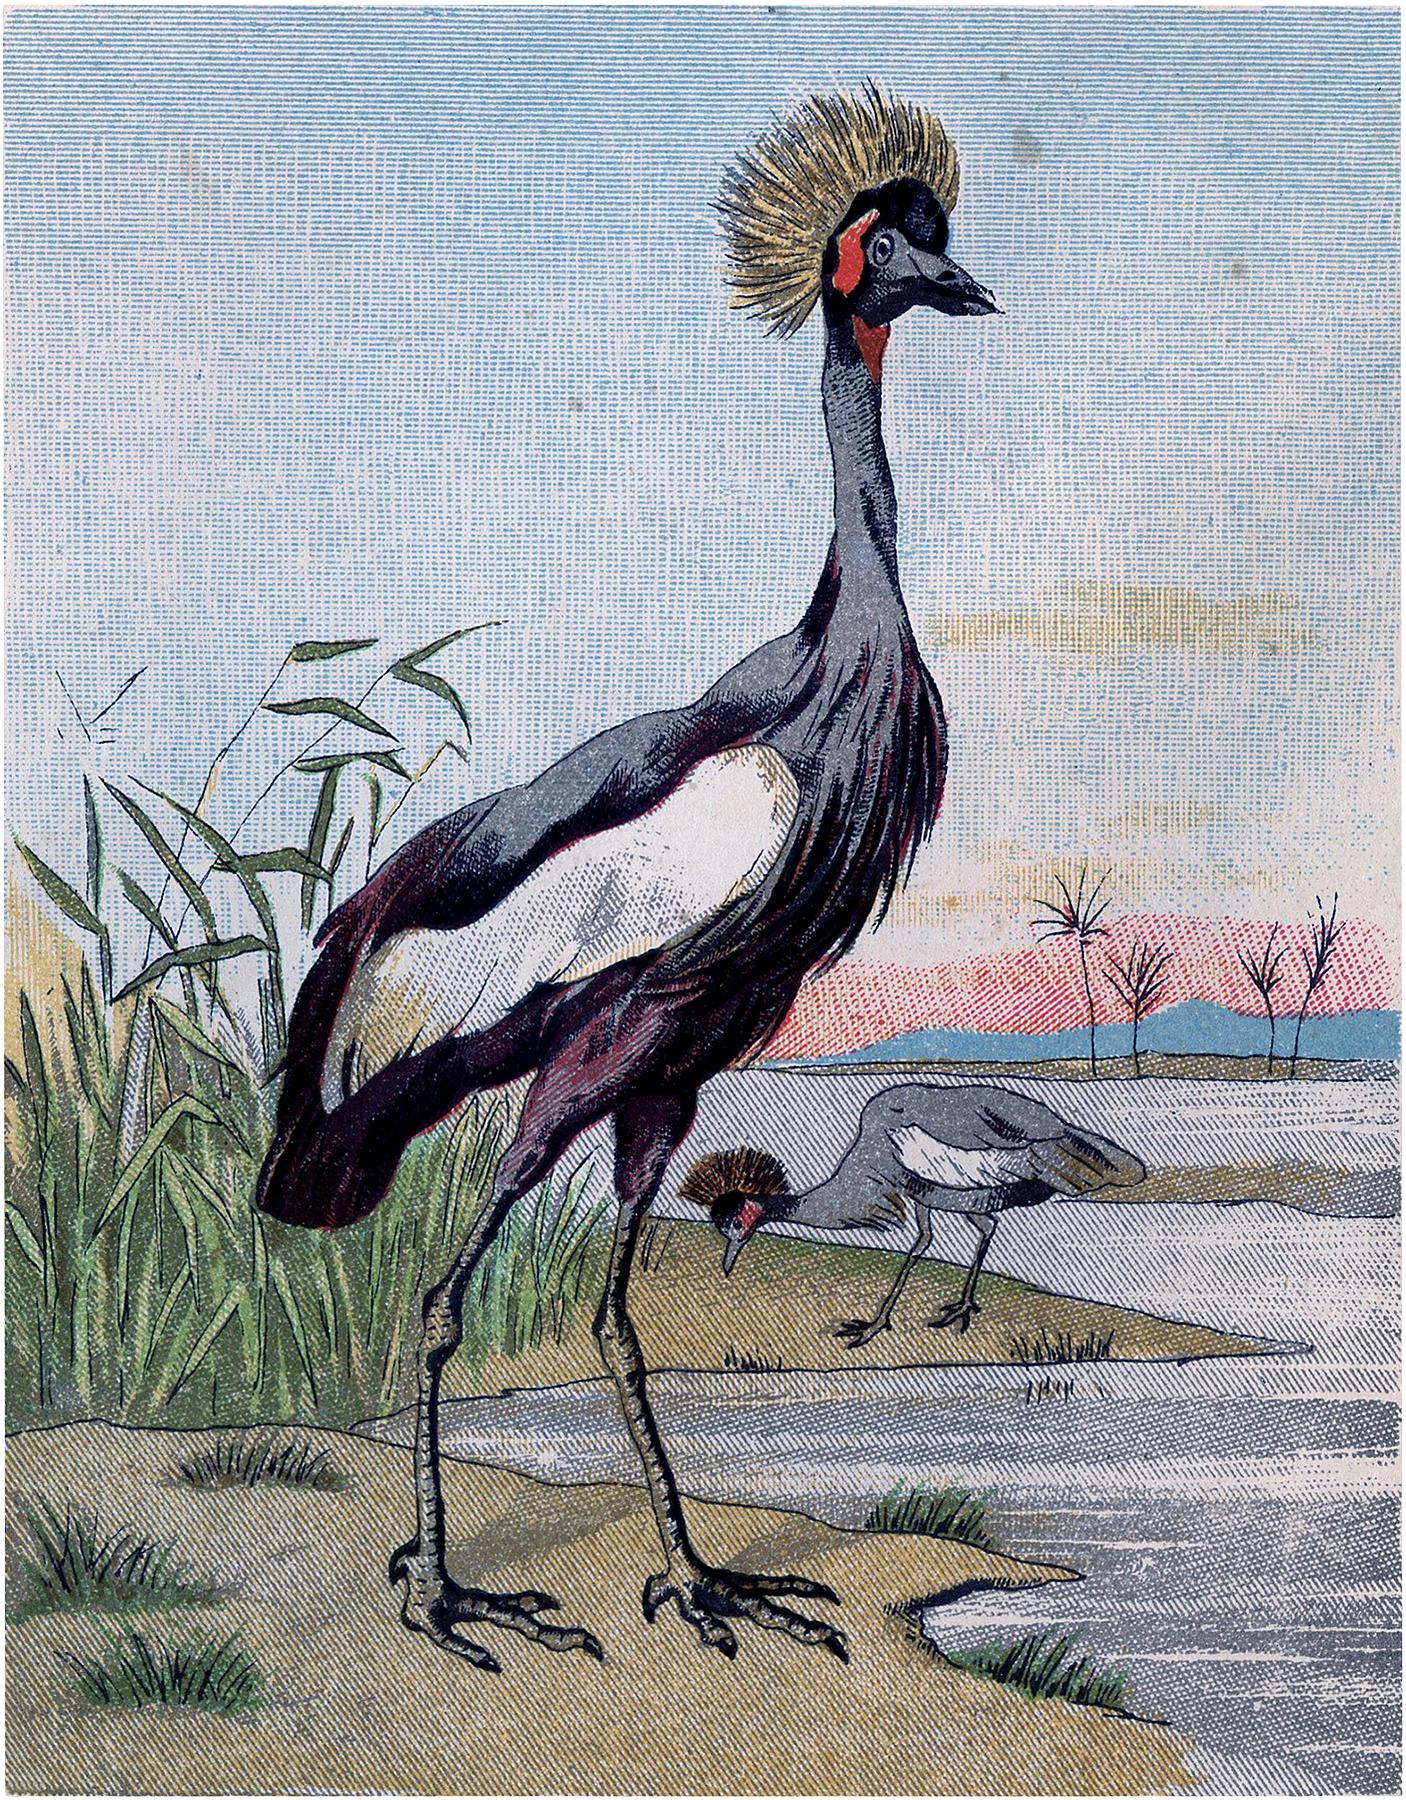 Interesting Bird Image